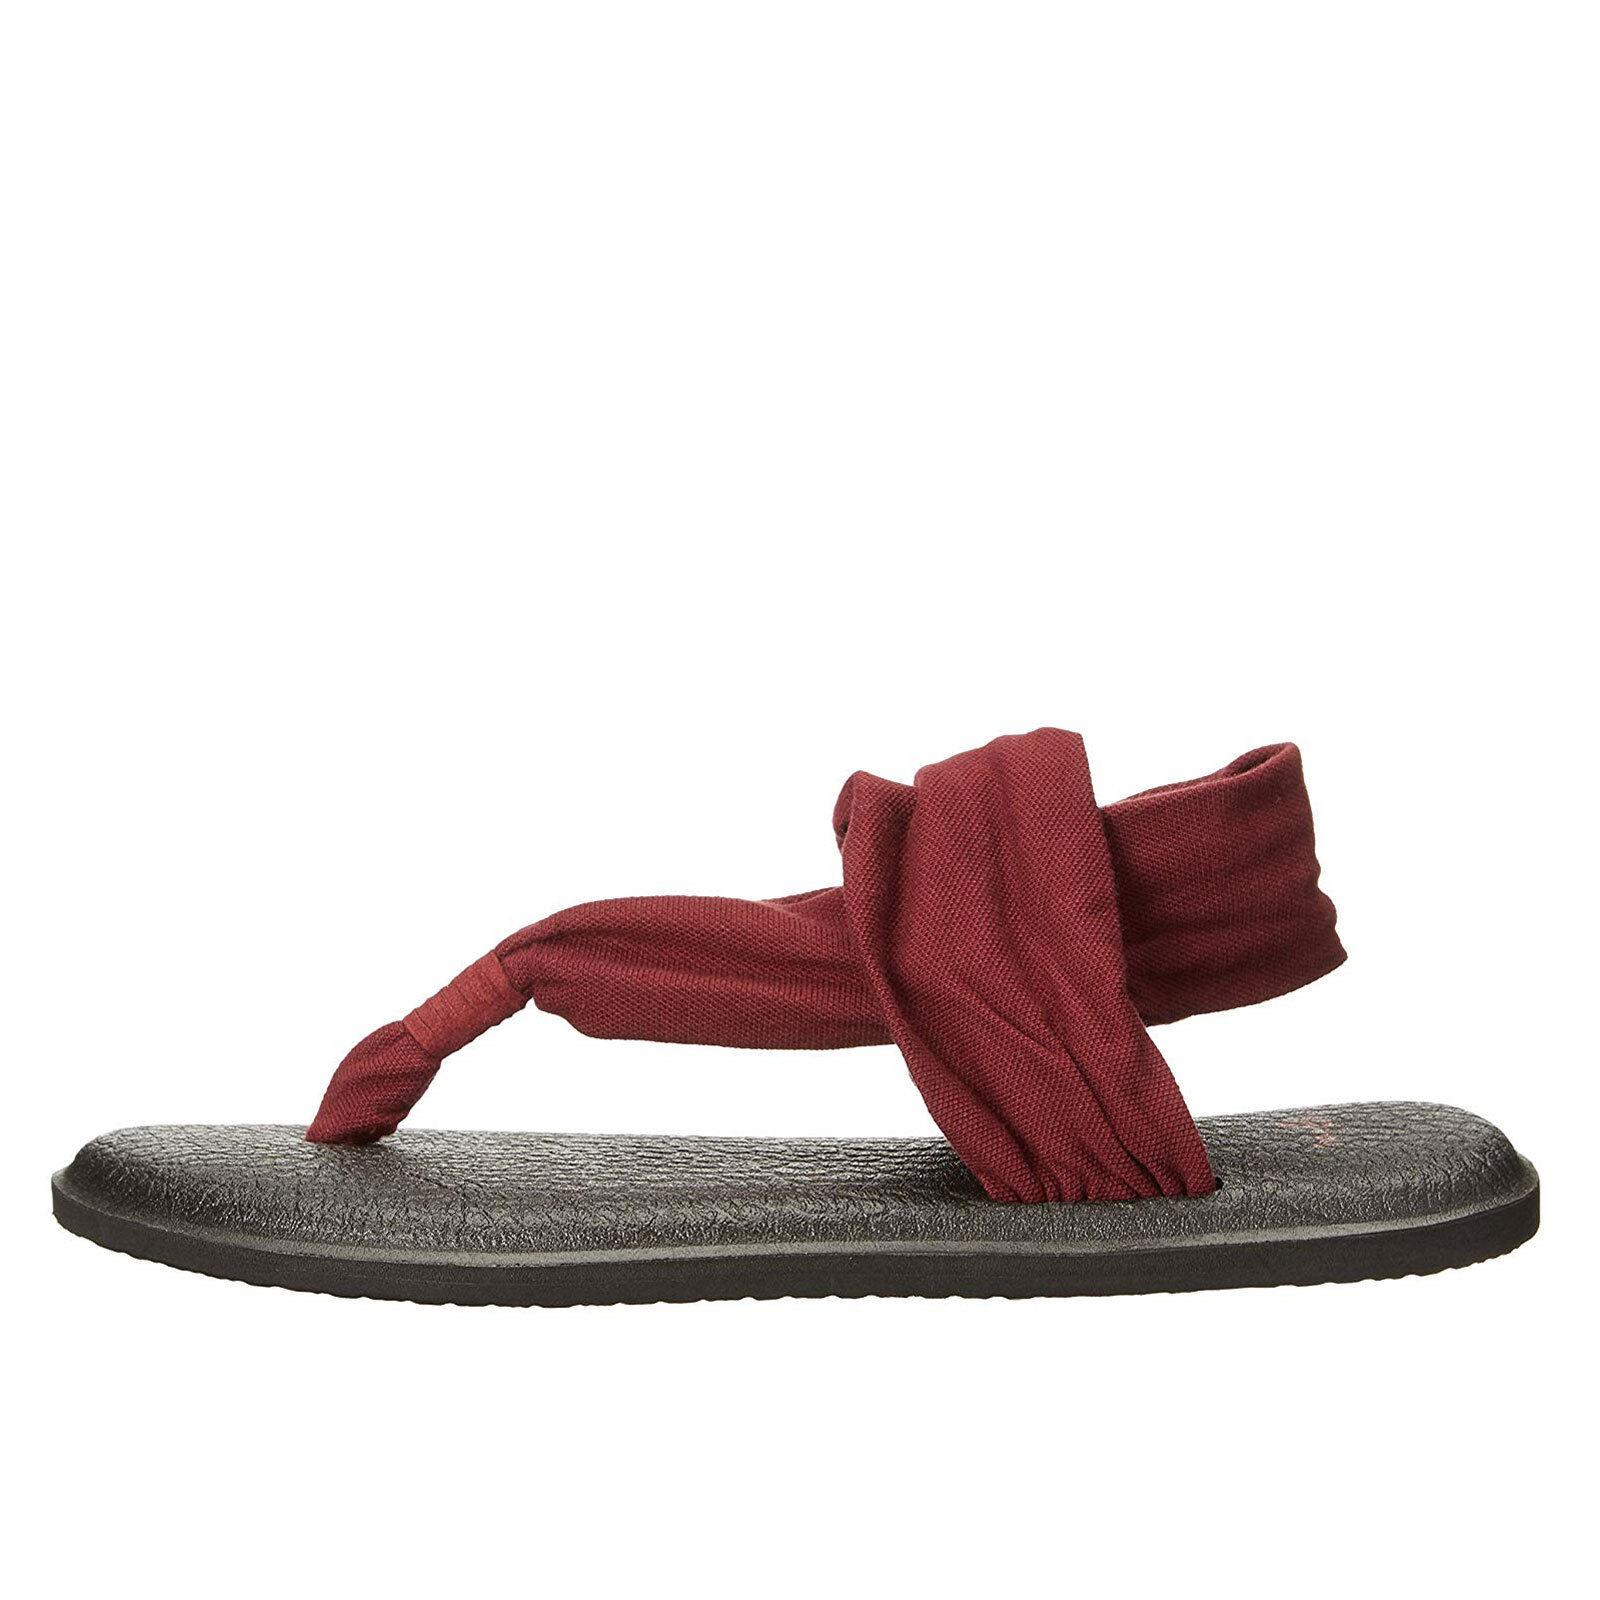 NWT Sanuk Yoga Sling 2 Spectrum Sandals Flip Flops Pink Cabaret Sz 7 8 9 11